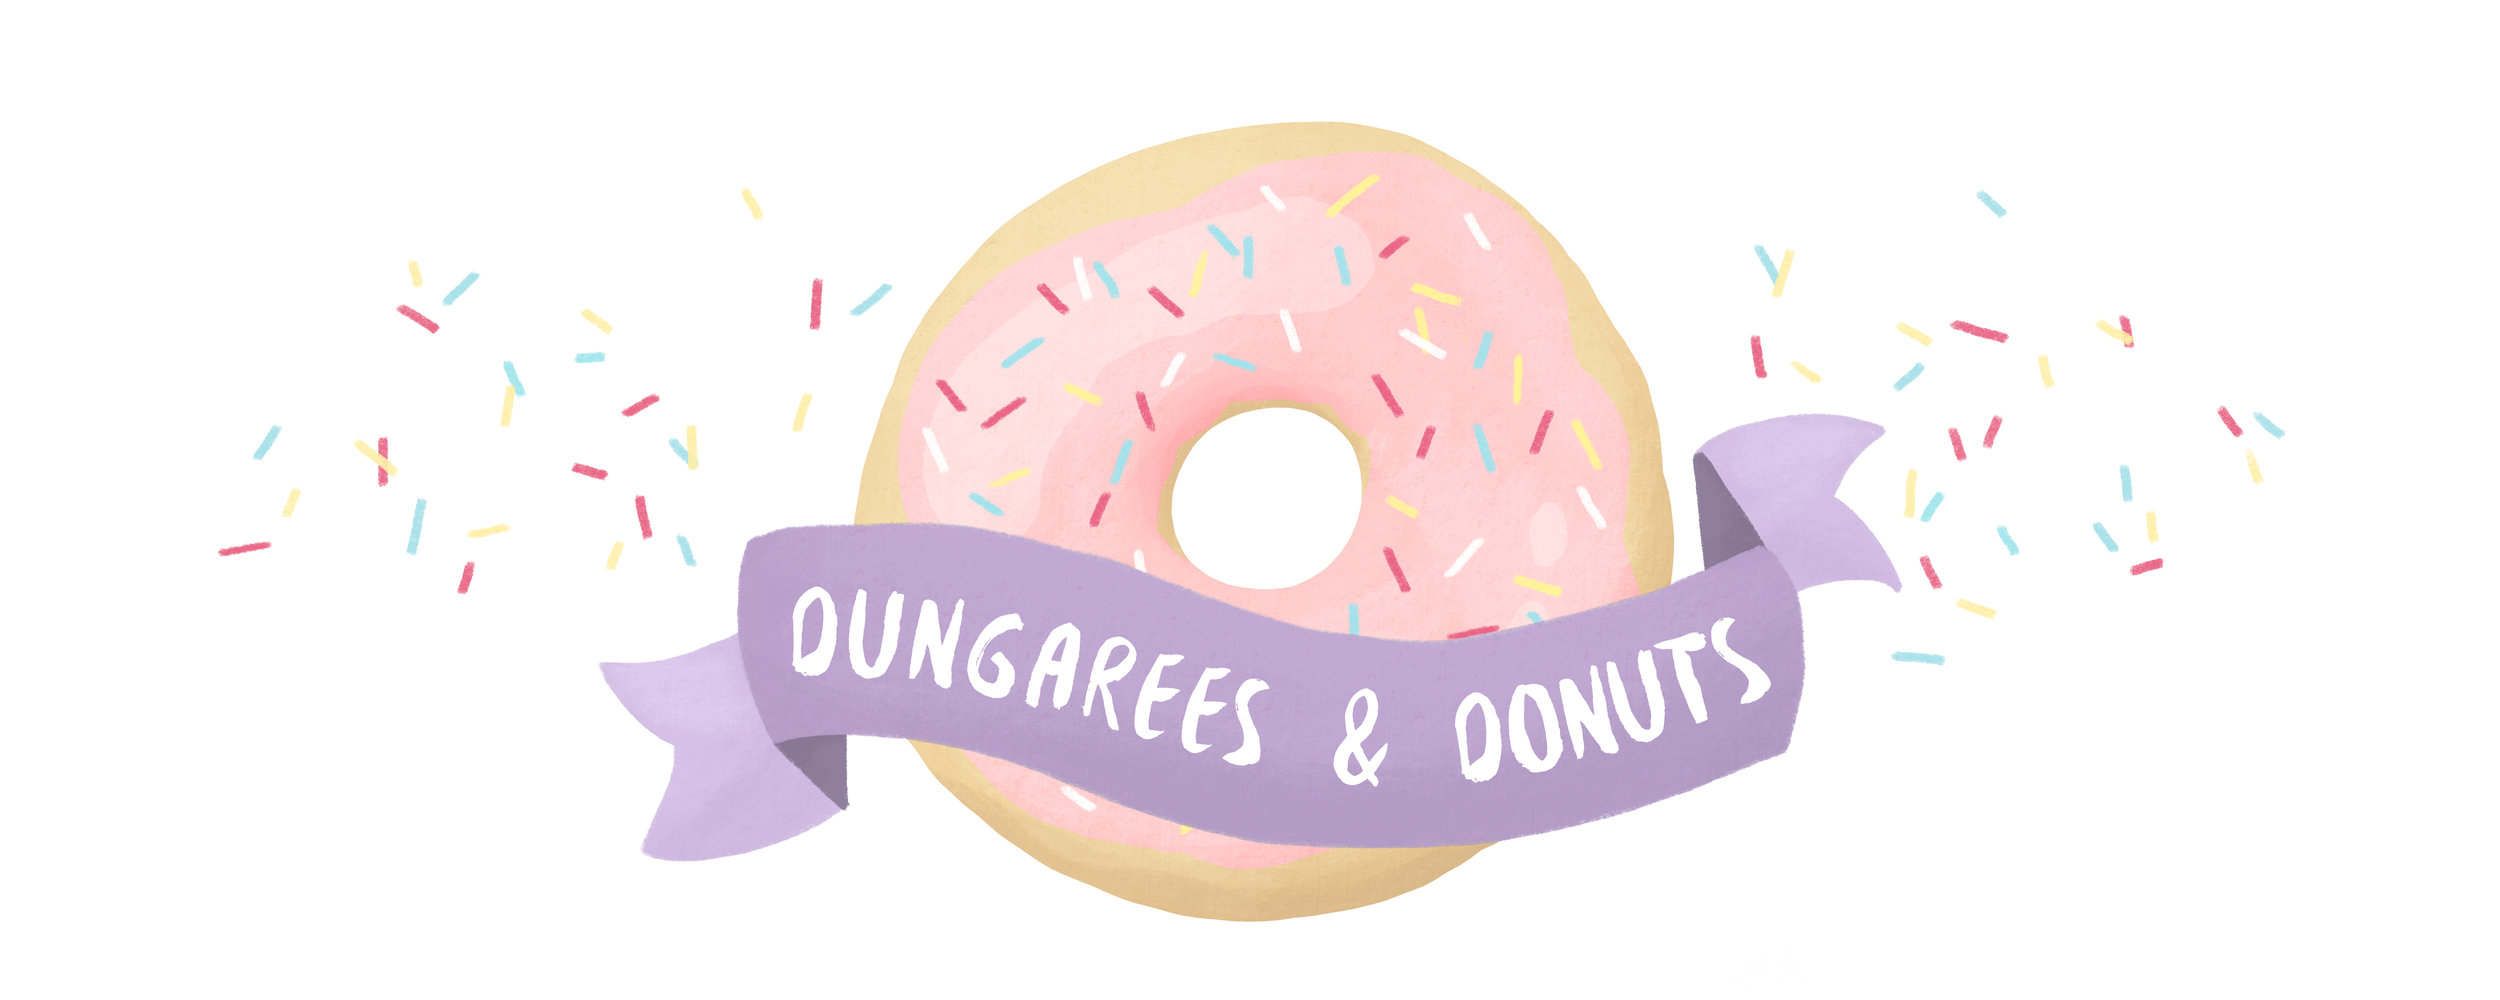 dungarees & donuts header.jpg